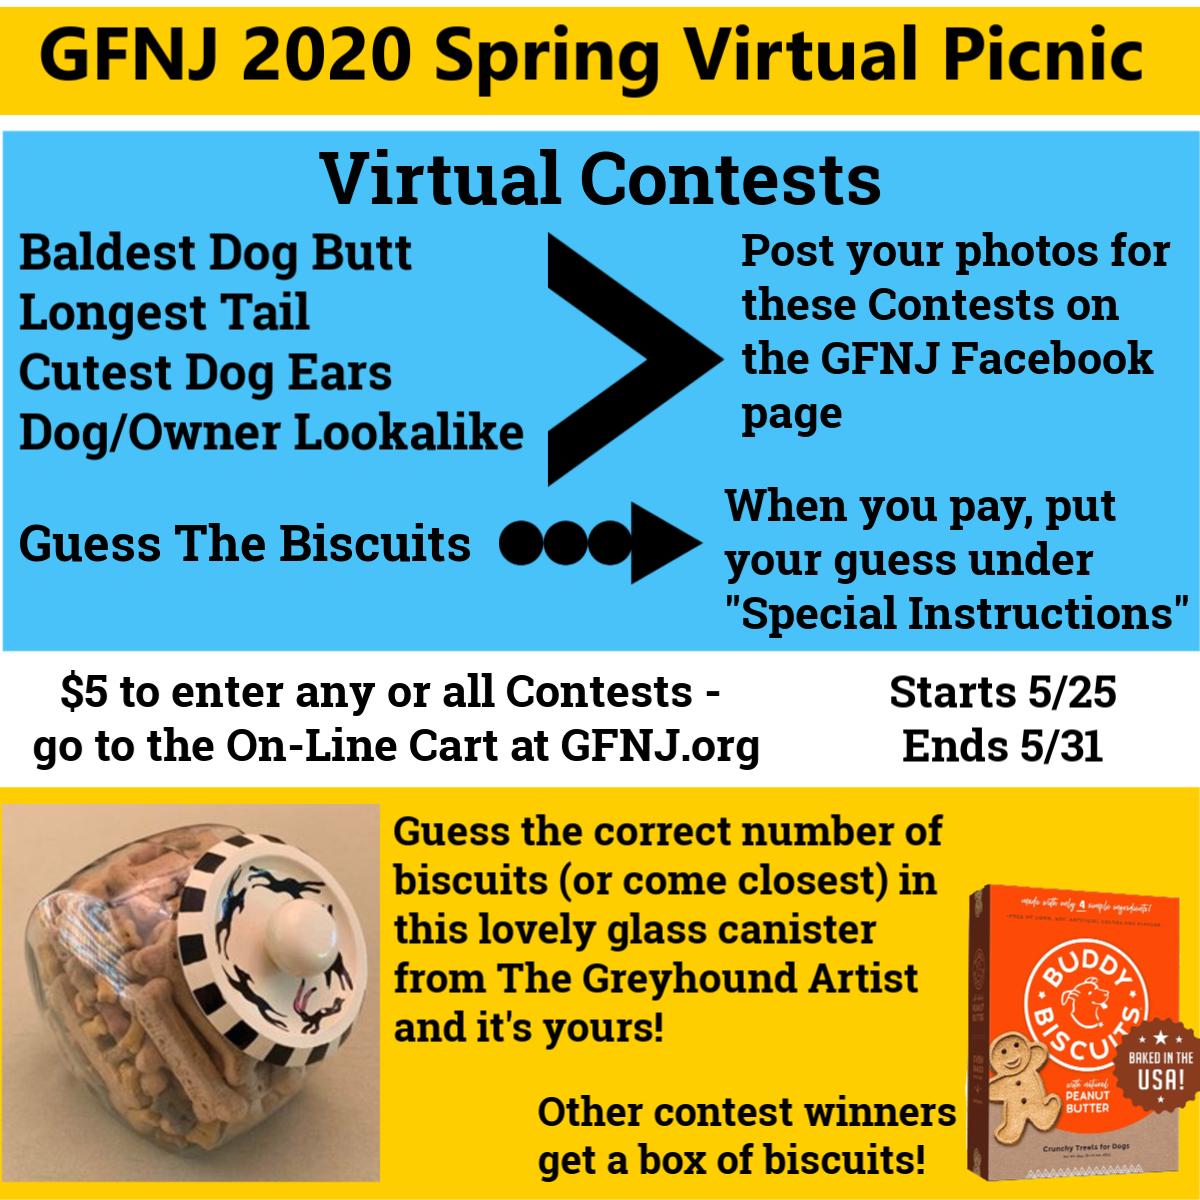 2020 Virtual Picnic Contests